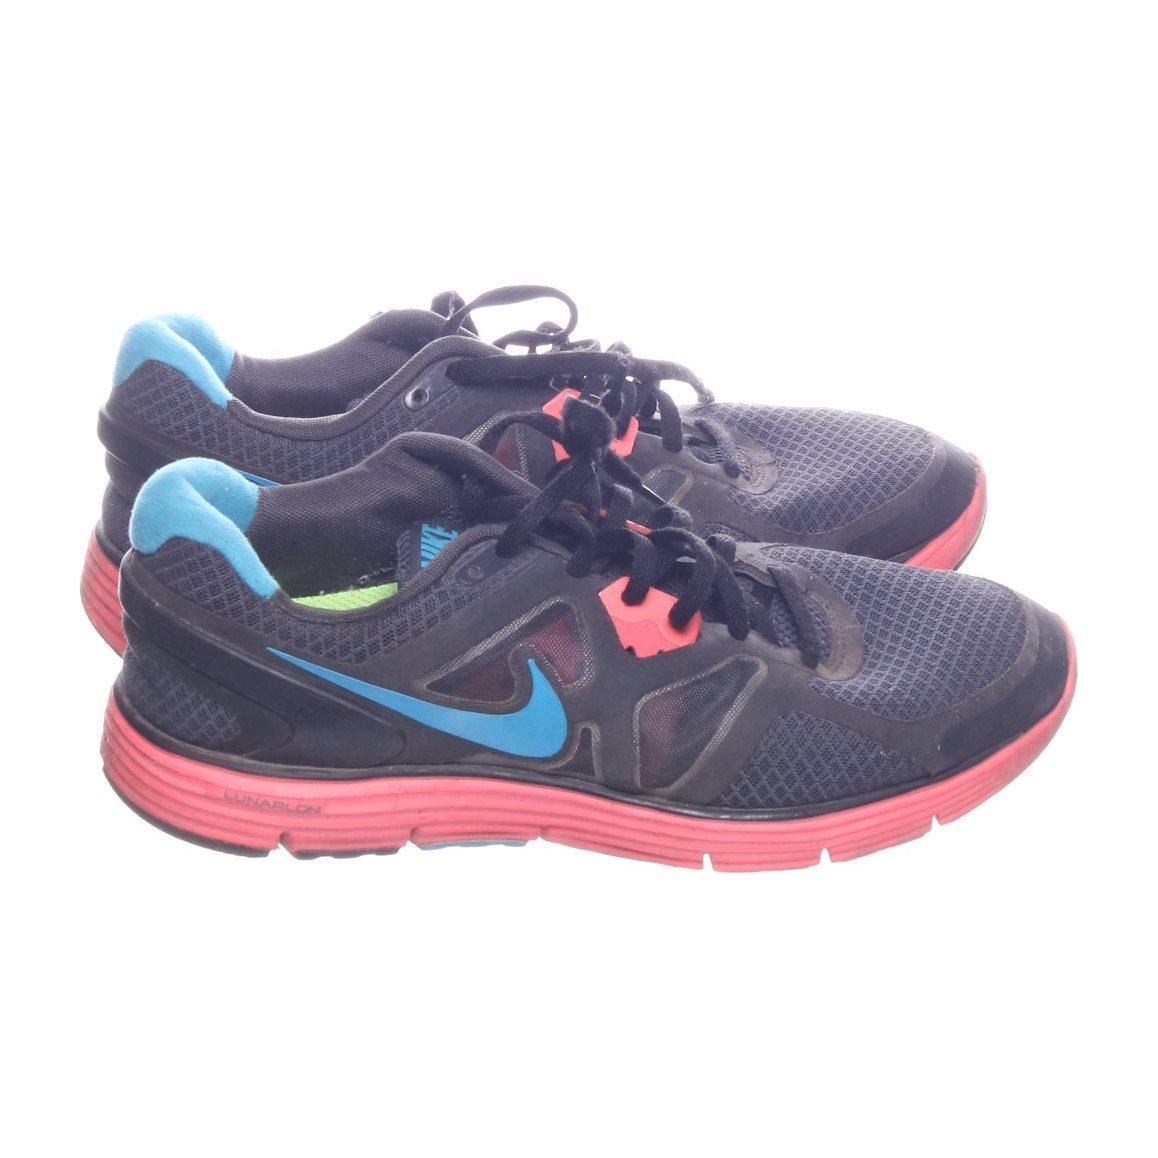 innovative design 40a51 a86d4 Nike, Träningsskor, Strl  40.5, LUNARGLIDE 3, Svart Flerfärgad